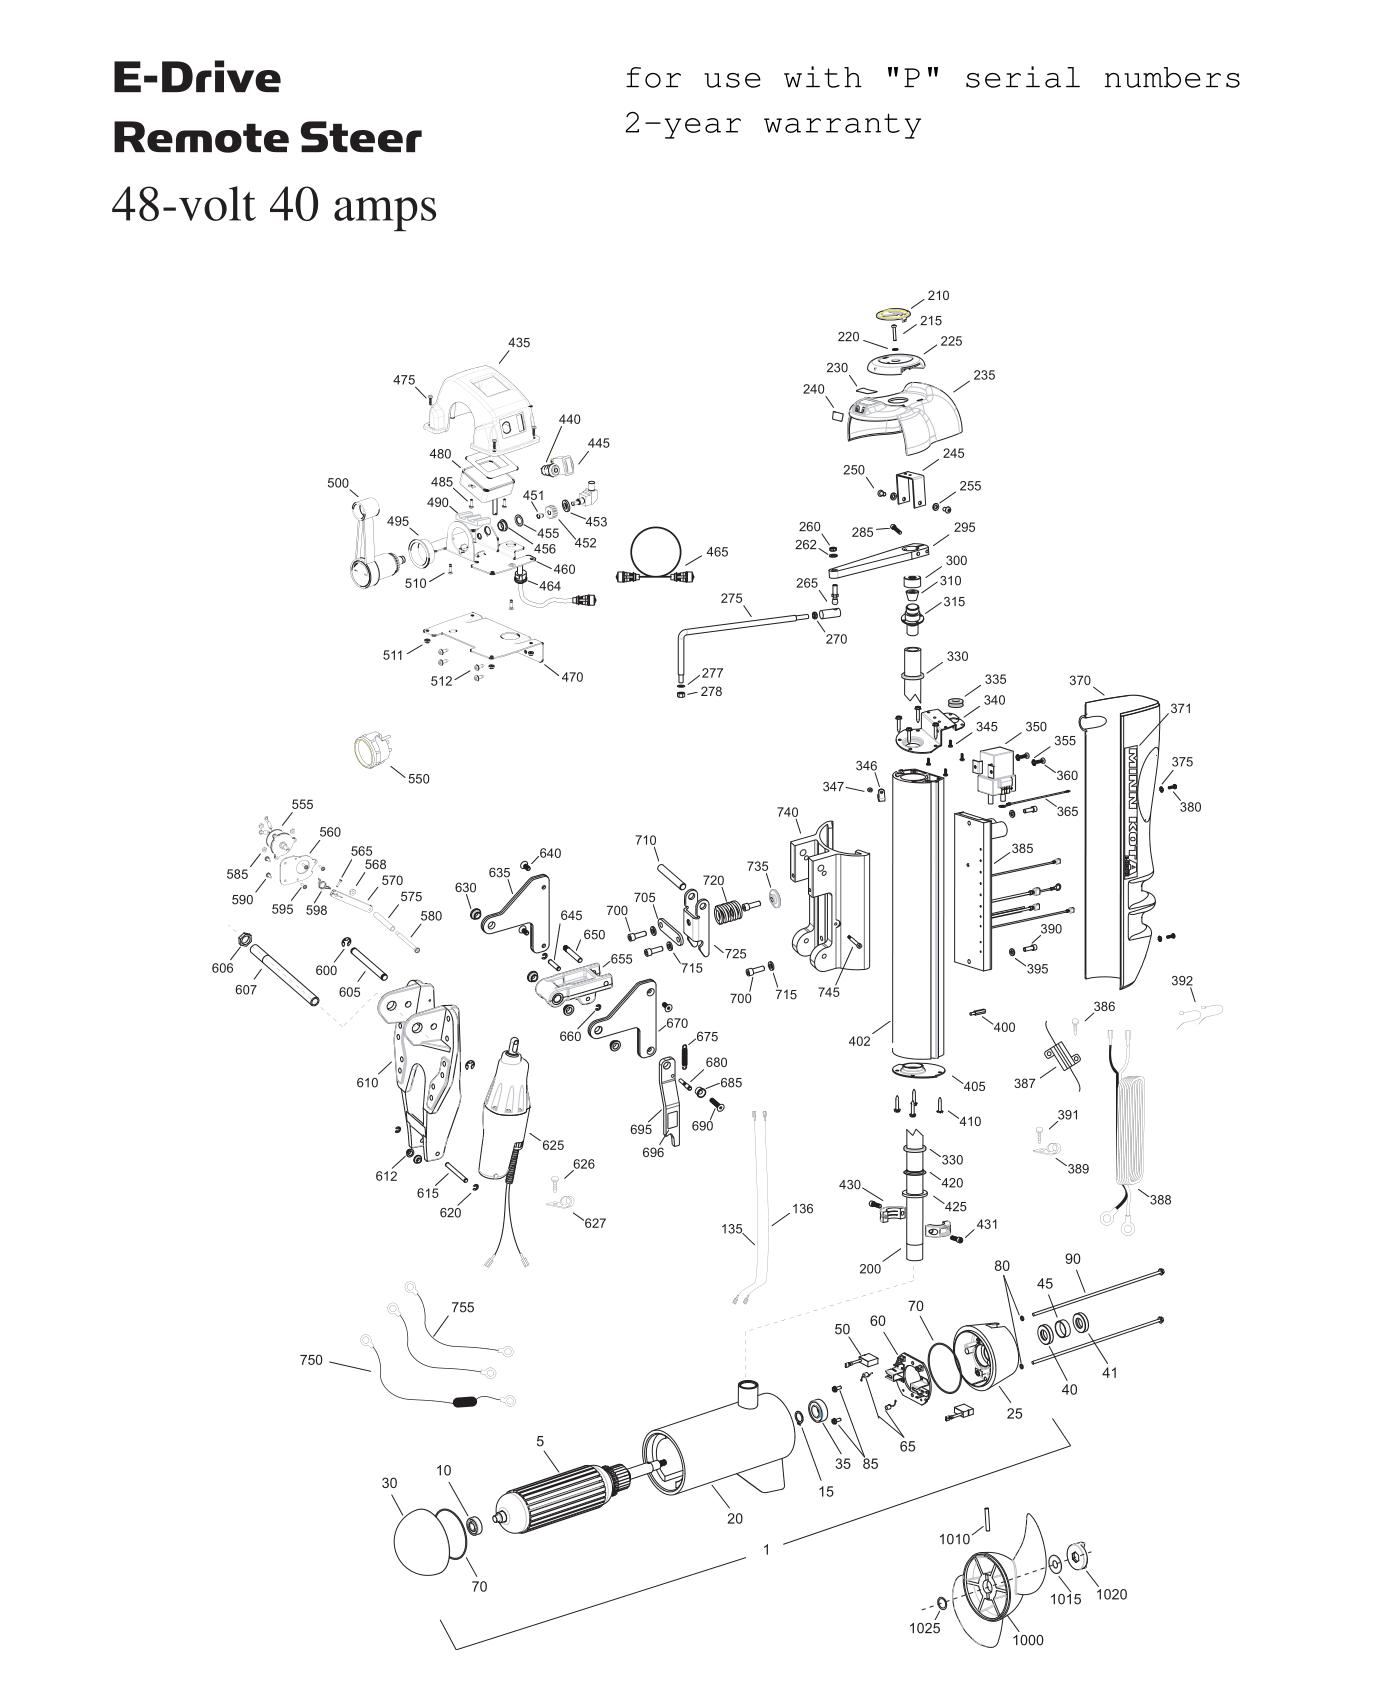 hight resolution of minn kota e drive parts 2015 from fish307 com minn kota e drive wiring diagram source wiring diagram minn kota power drive 55 i pilot